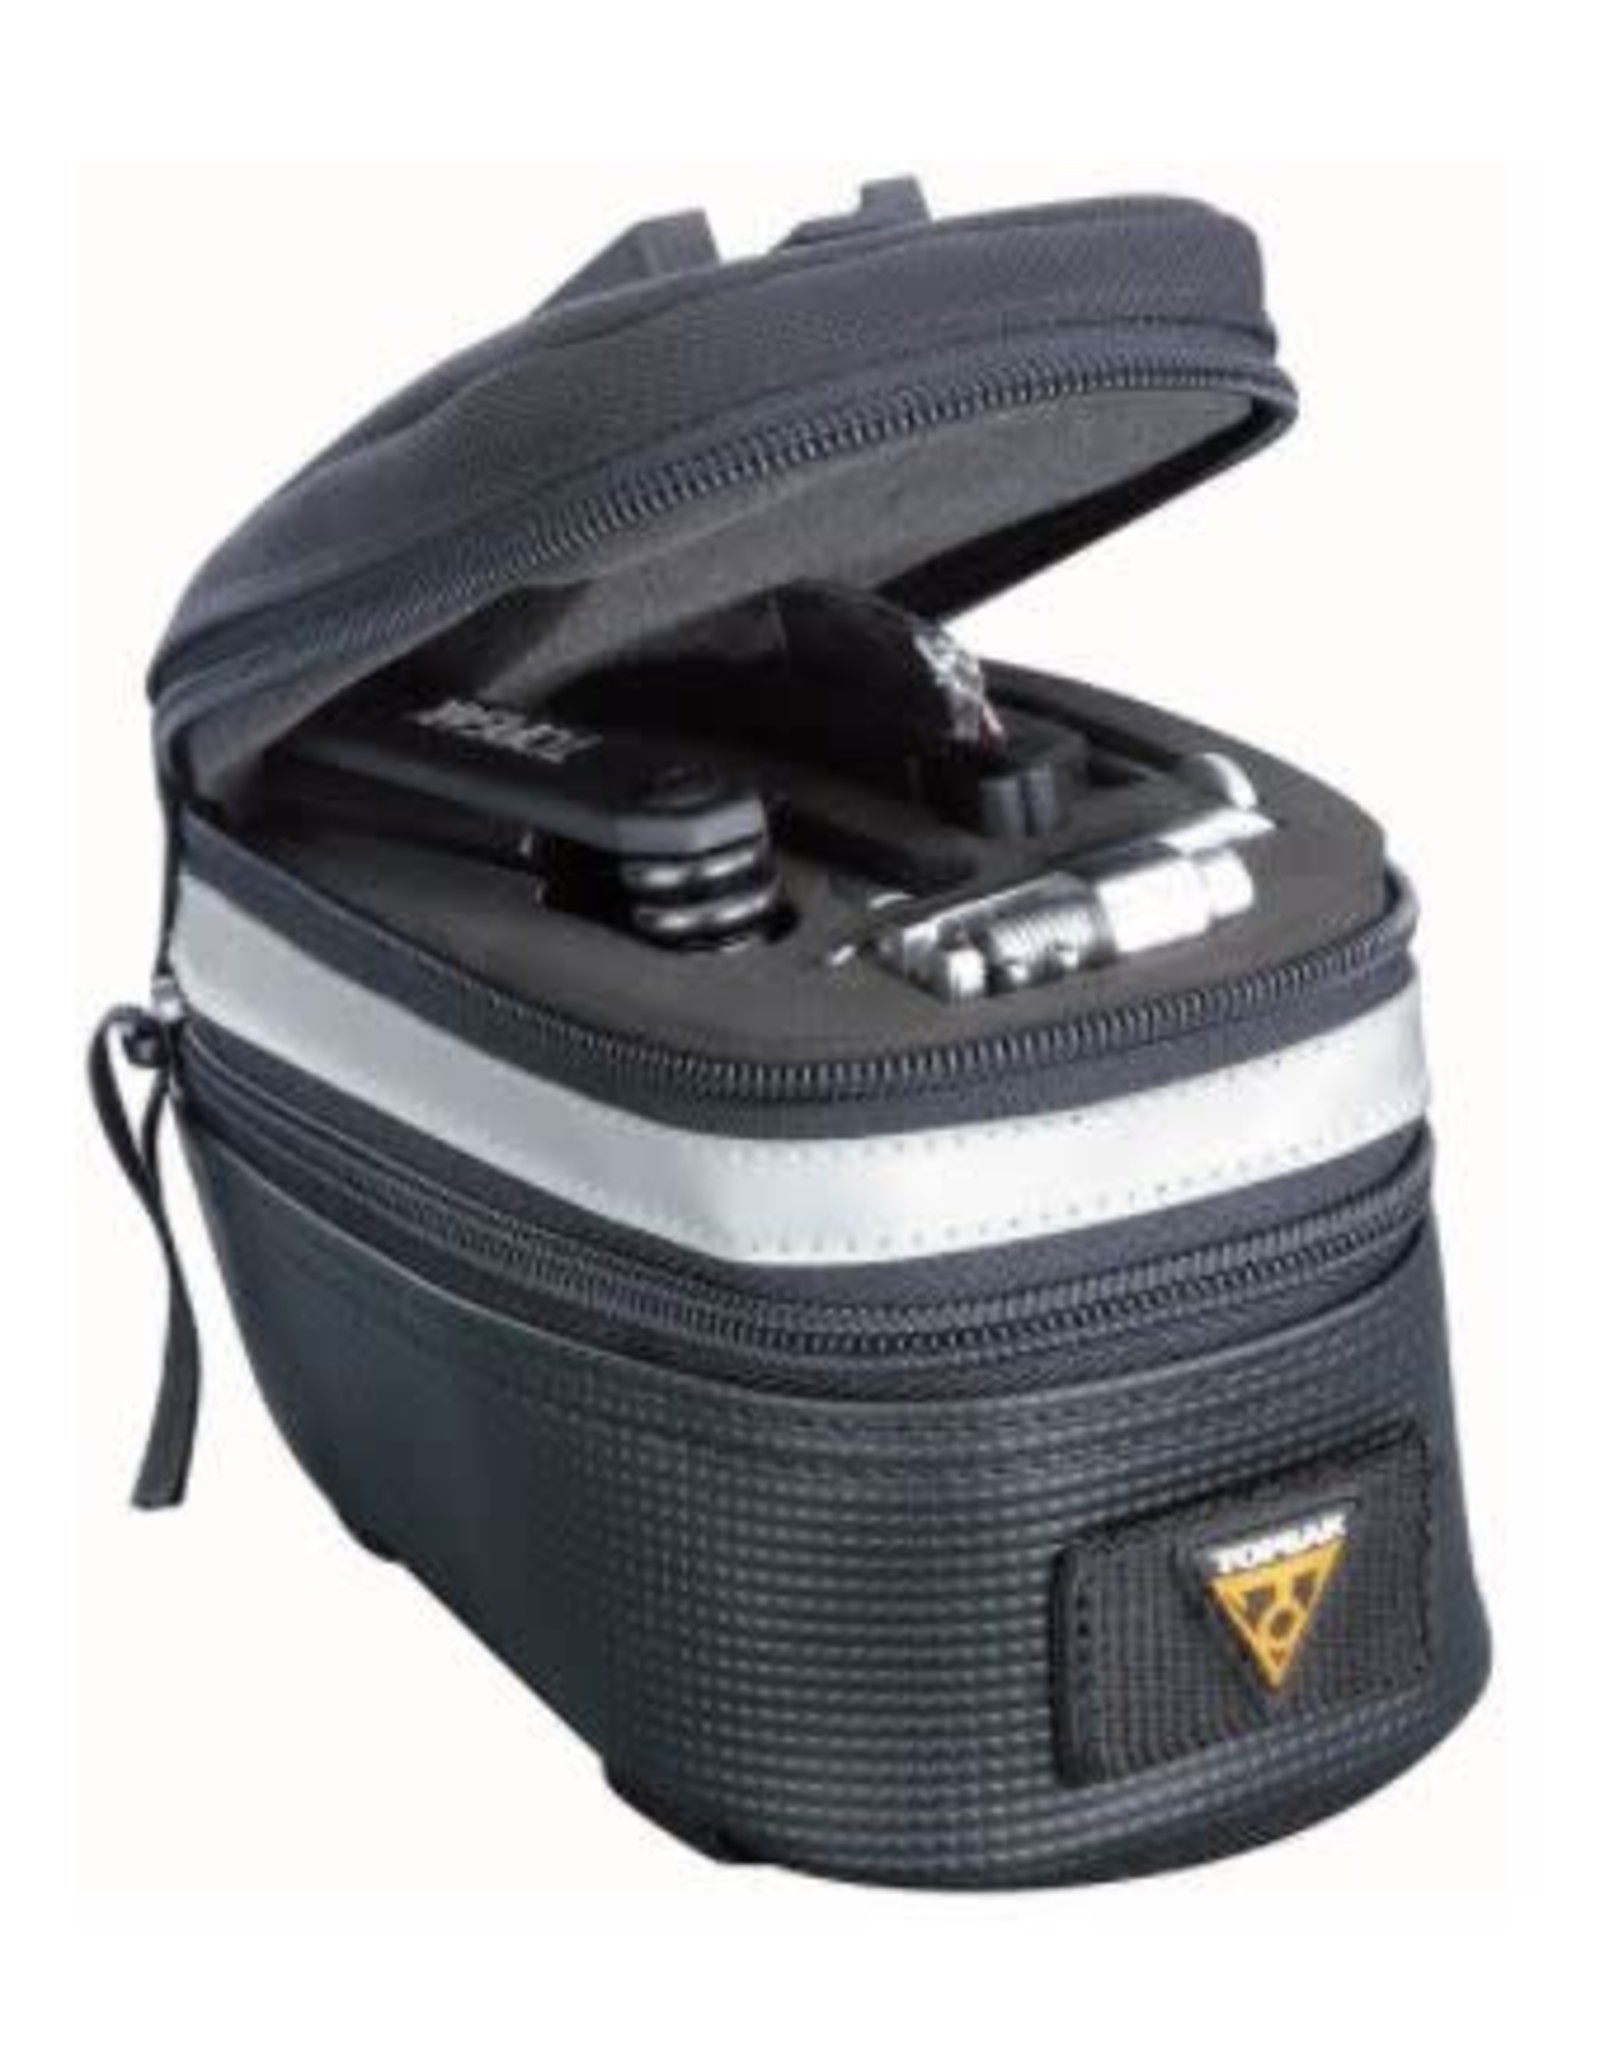 Topeak Saddle bag Topeak Survival Wdg with tools